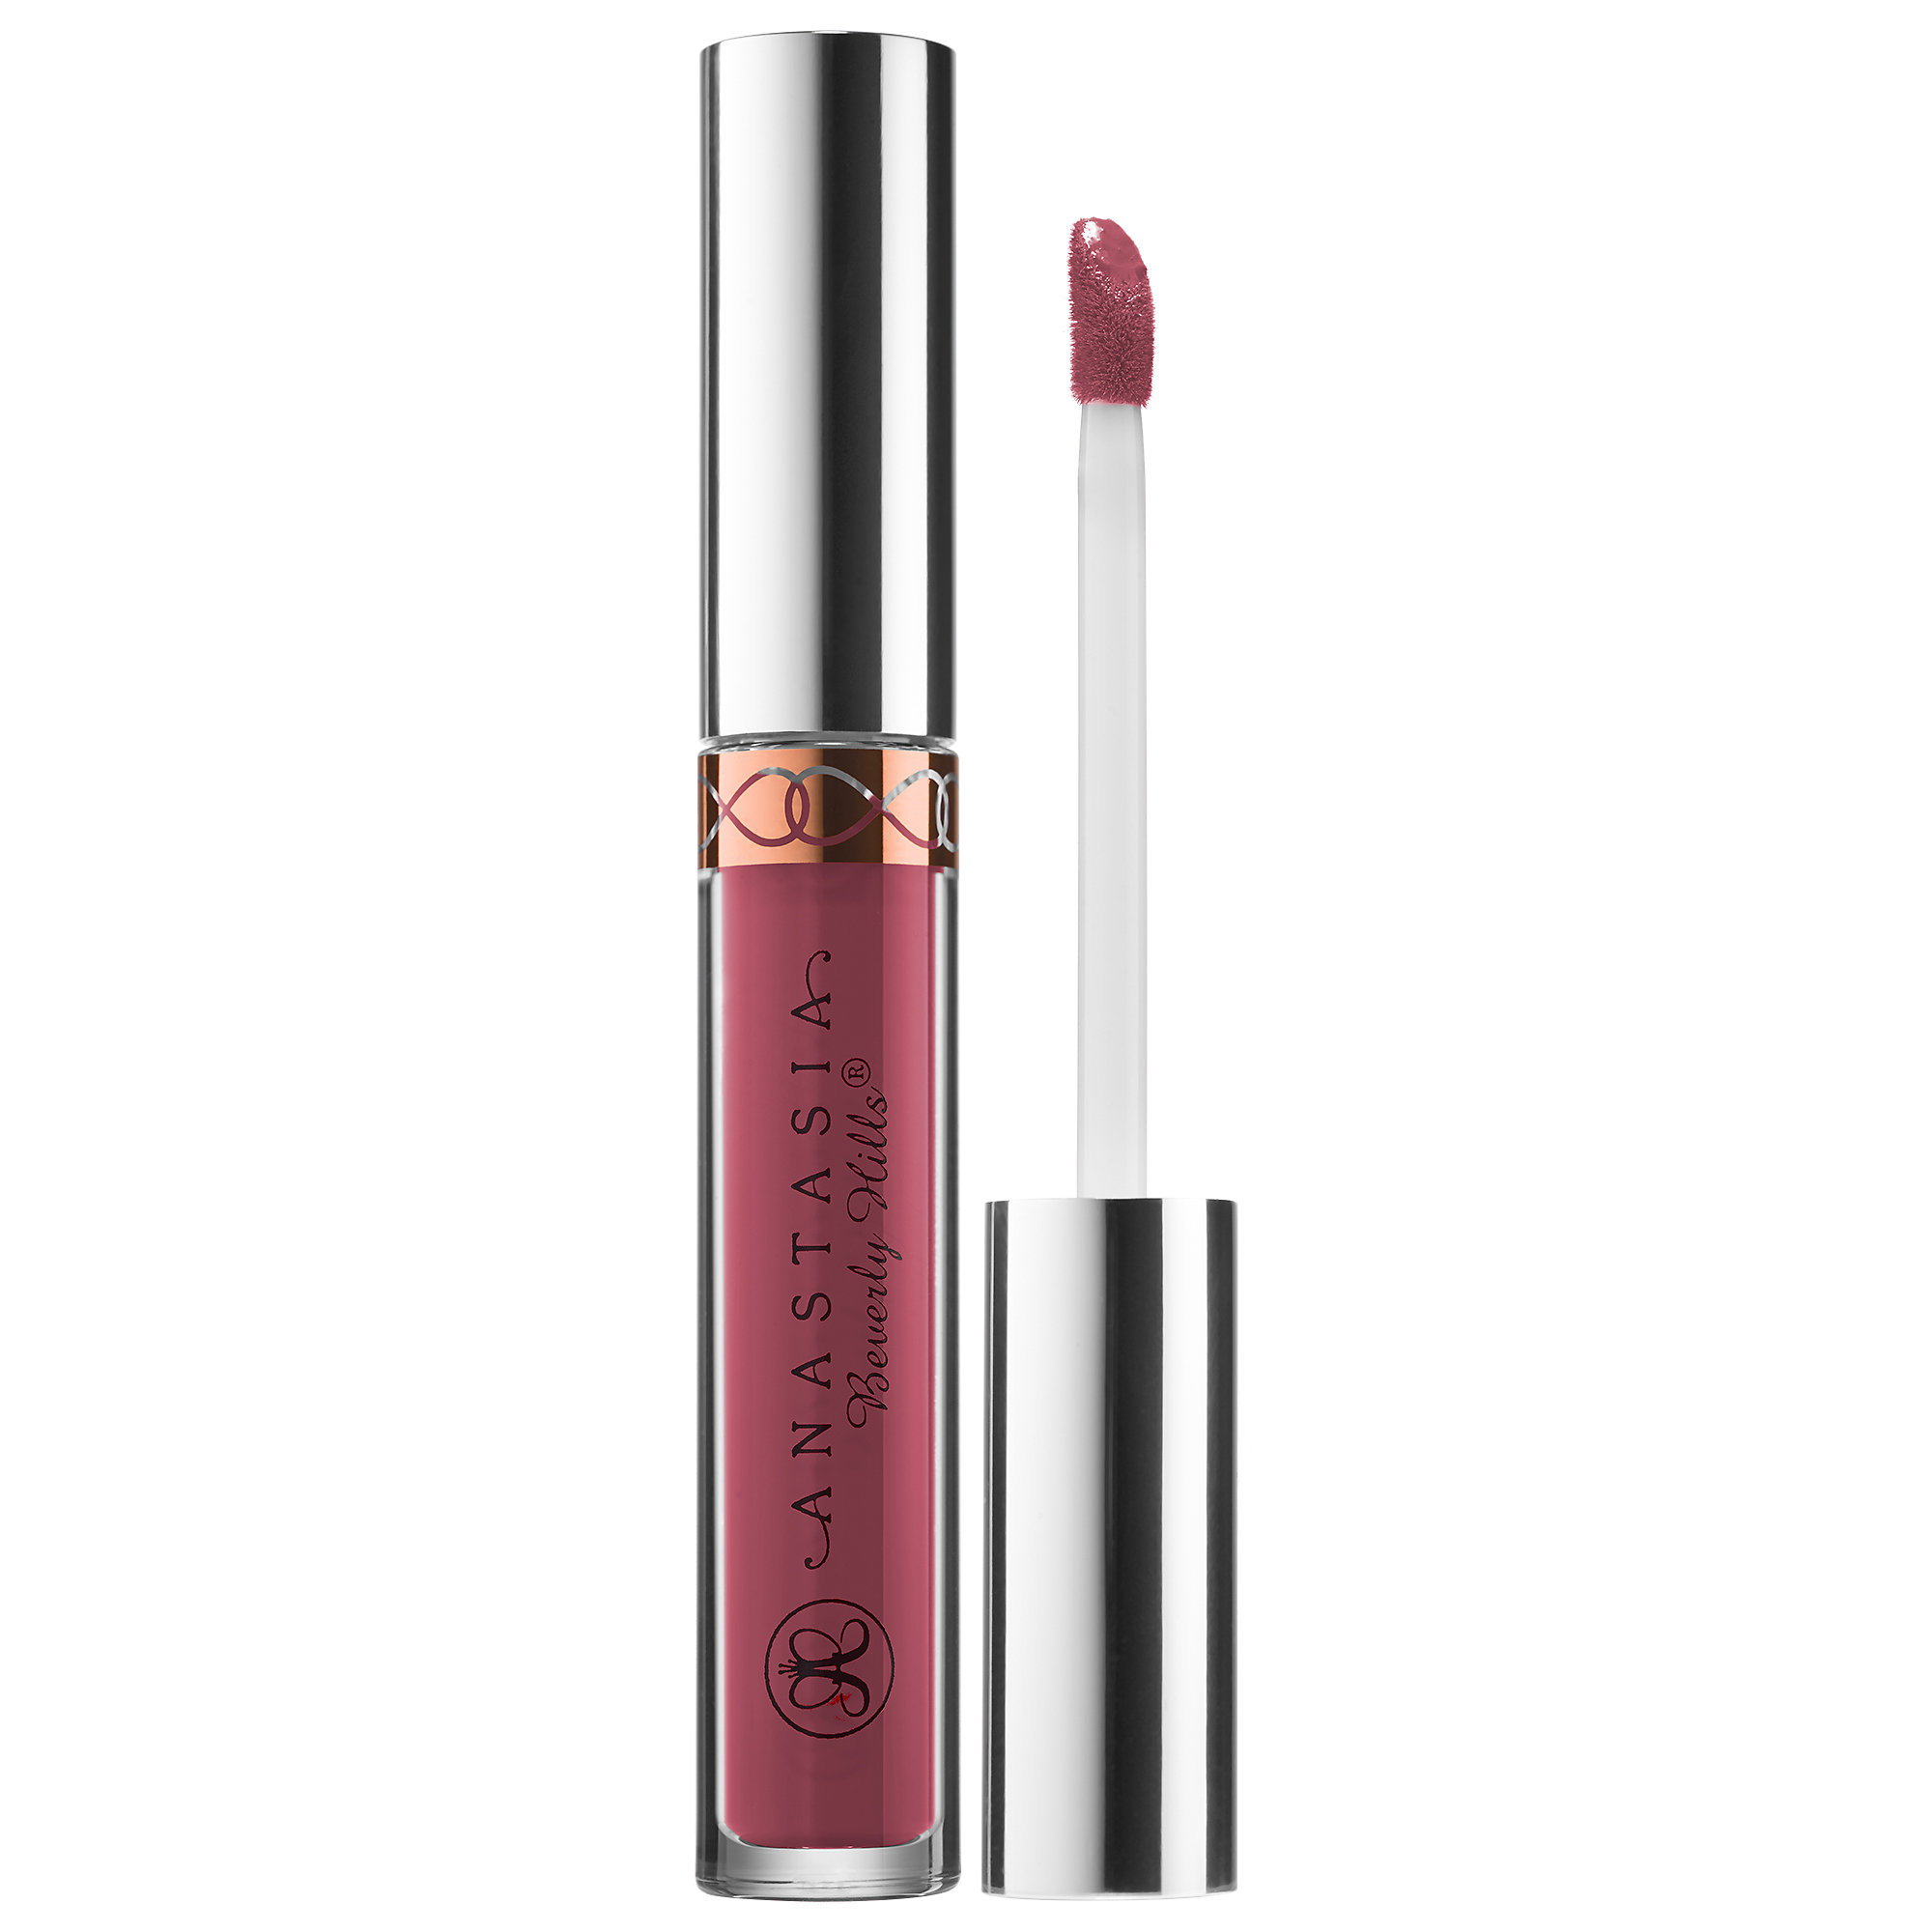 Anastasia Allison Liquid Lipstick